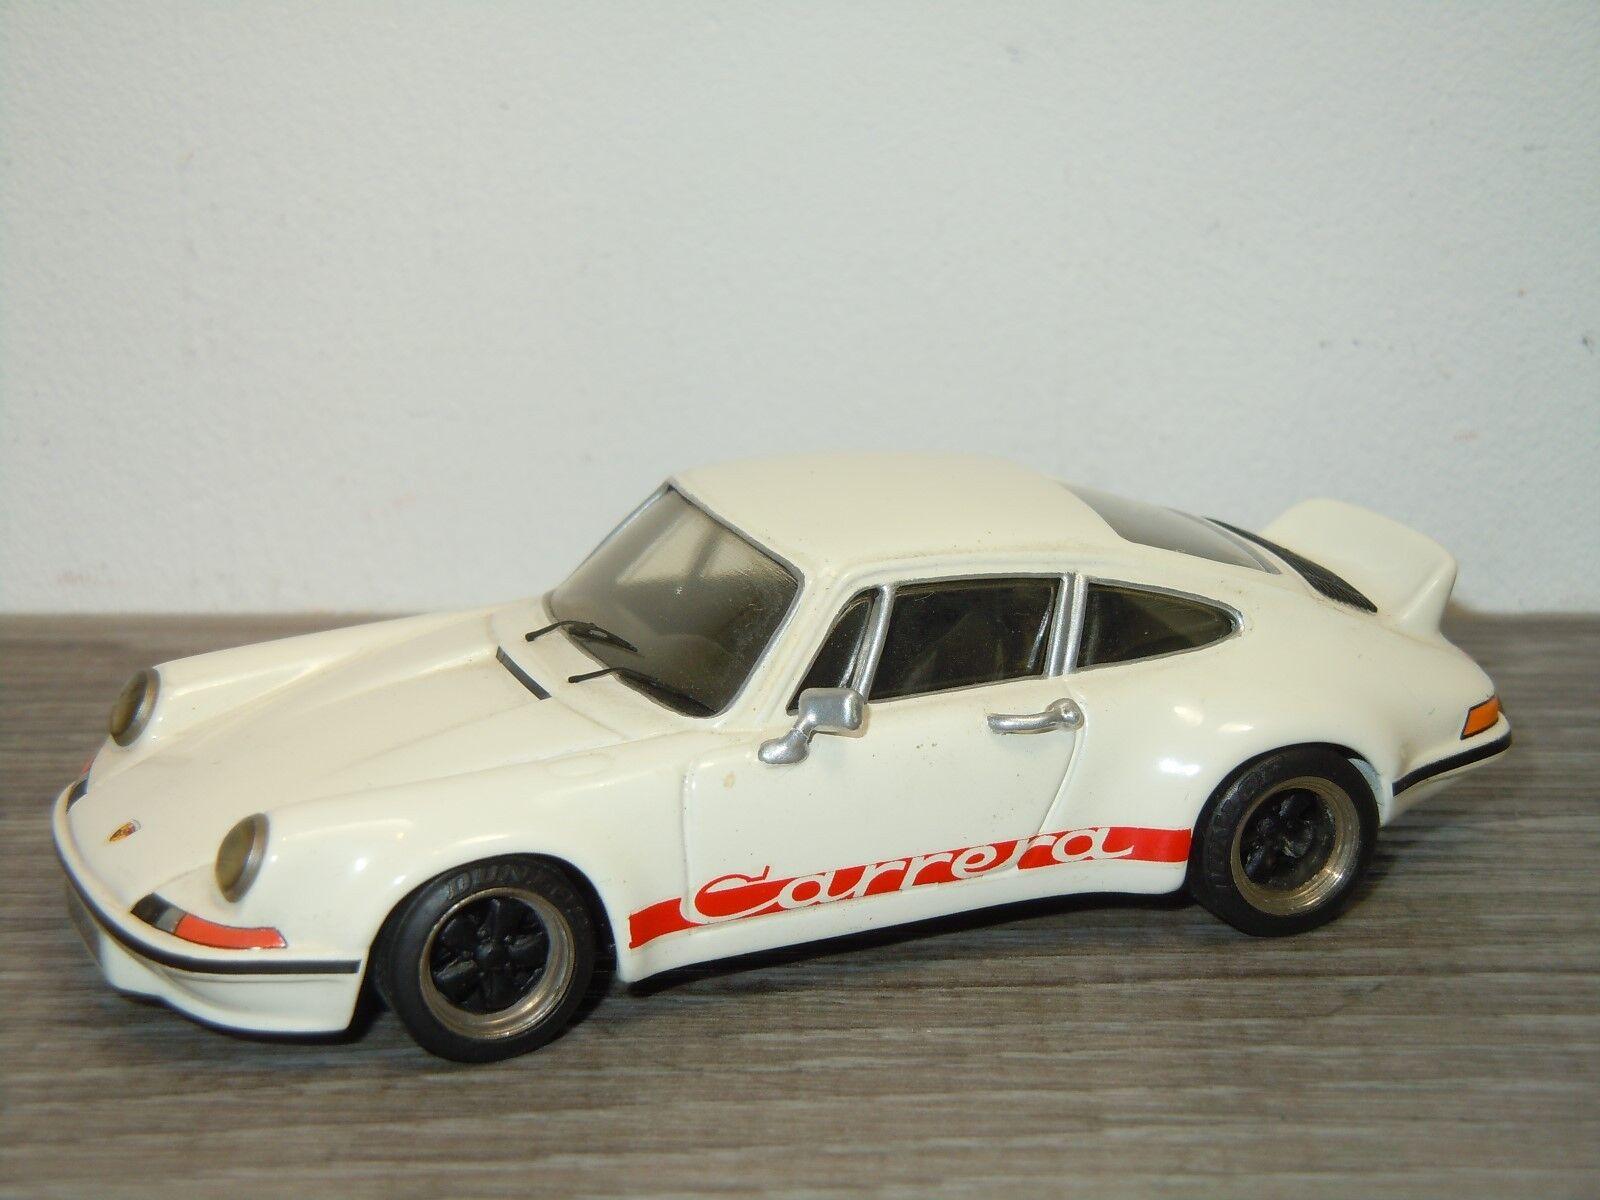 Porsche 911 Cocherera Sr Sr Sr 2.8 - amr Francia 1  43  33.962 4aa